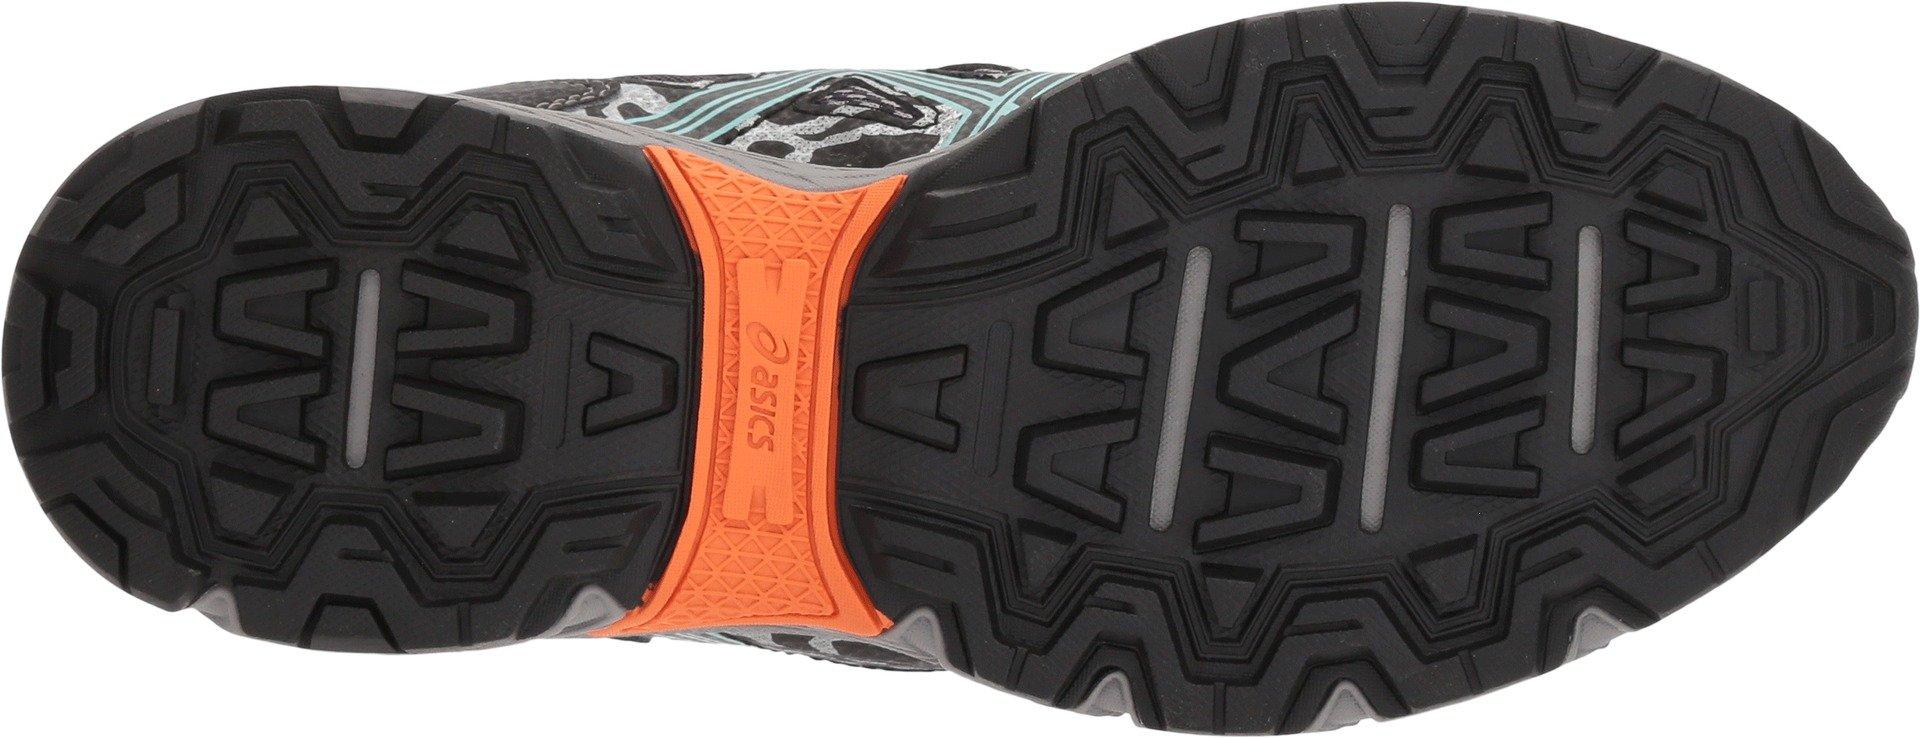 ASICS Womens Gel-Venture 6 Running Shoes Black/Ice Green/Orange 5 B(M) US by ASICS (Image #3)